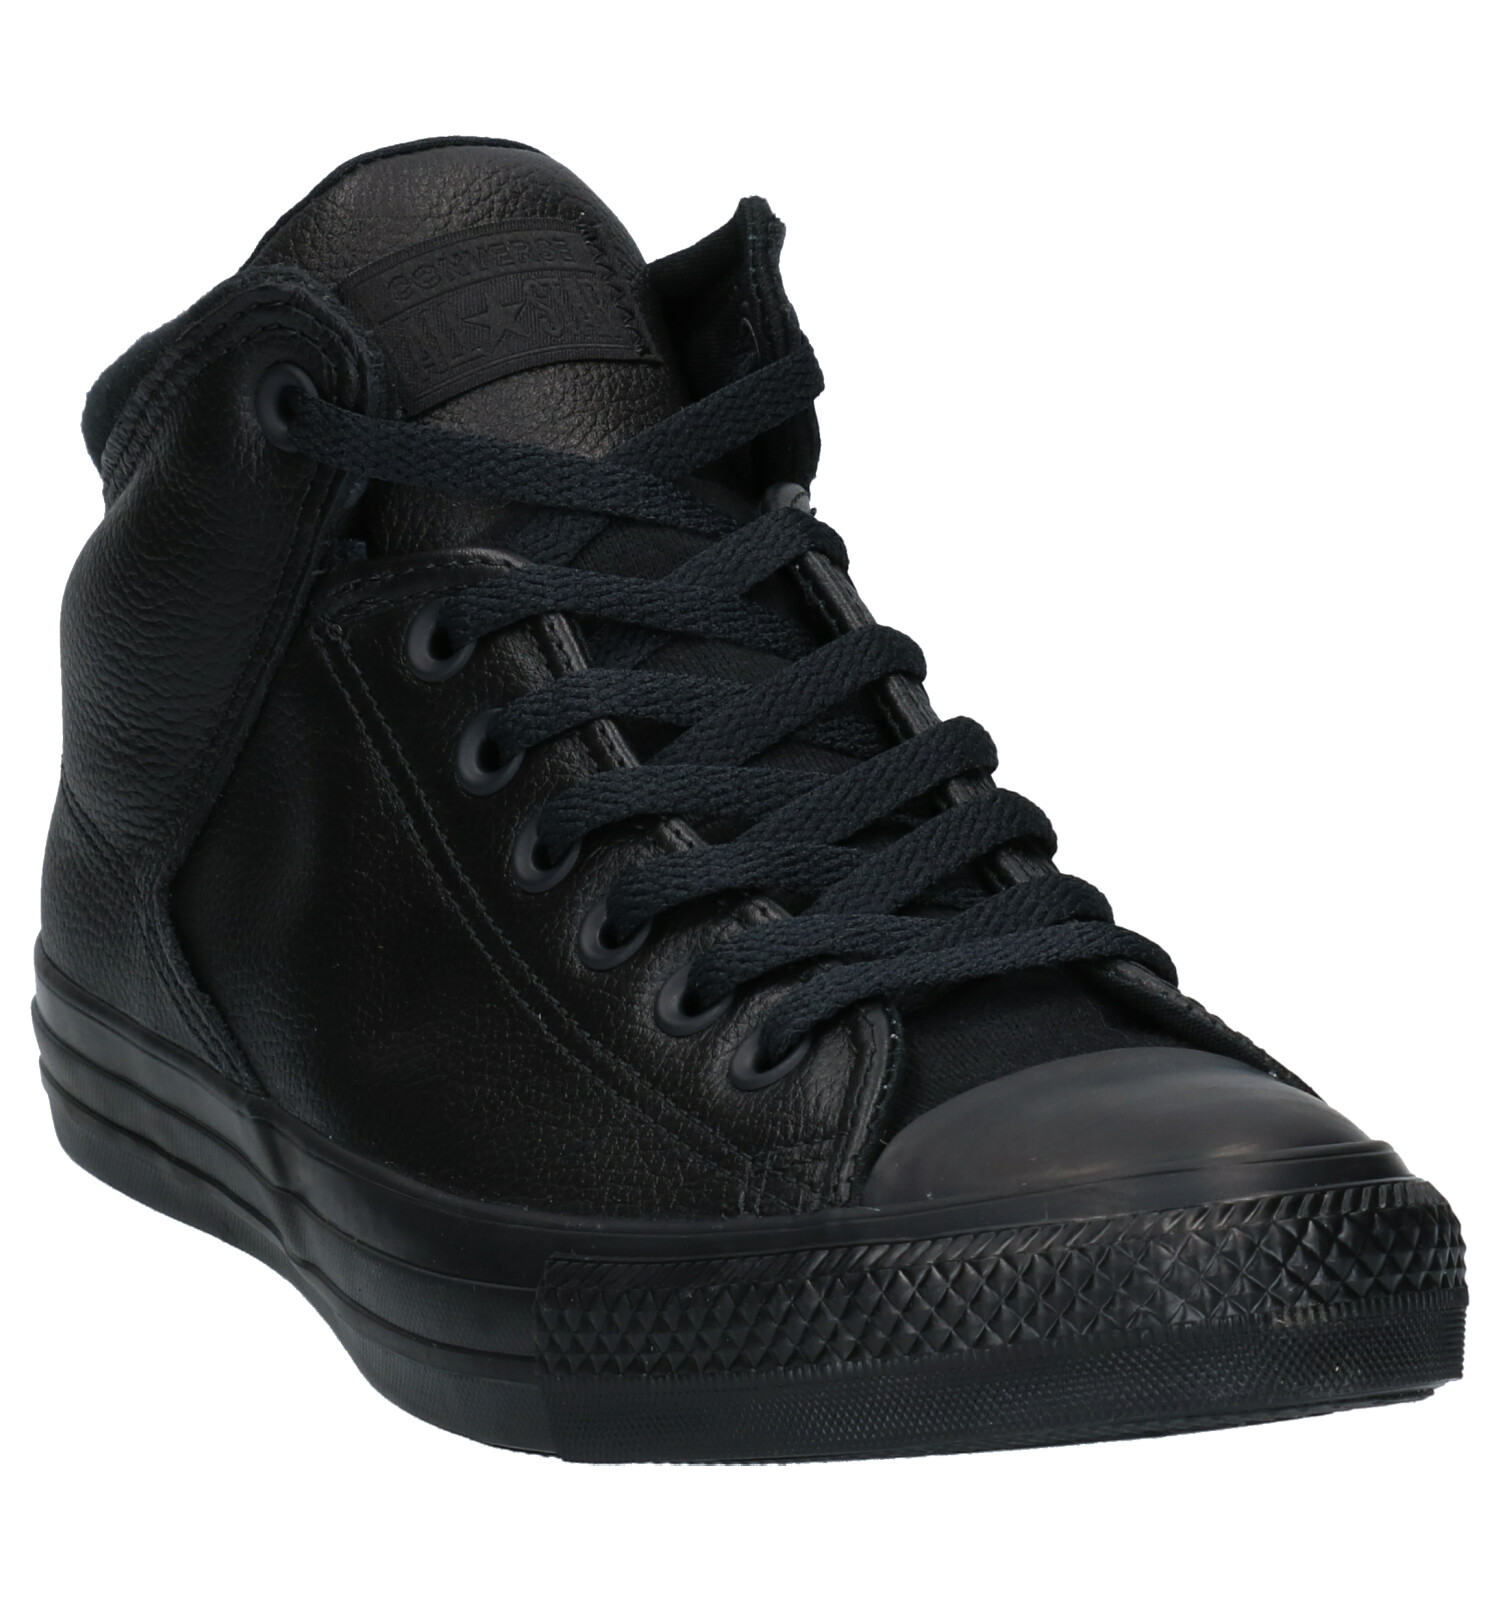 Converse As Sneakers Street Zwarte Hi H9YW2EDI